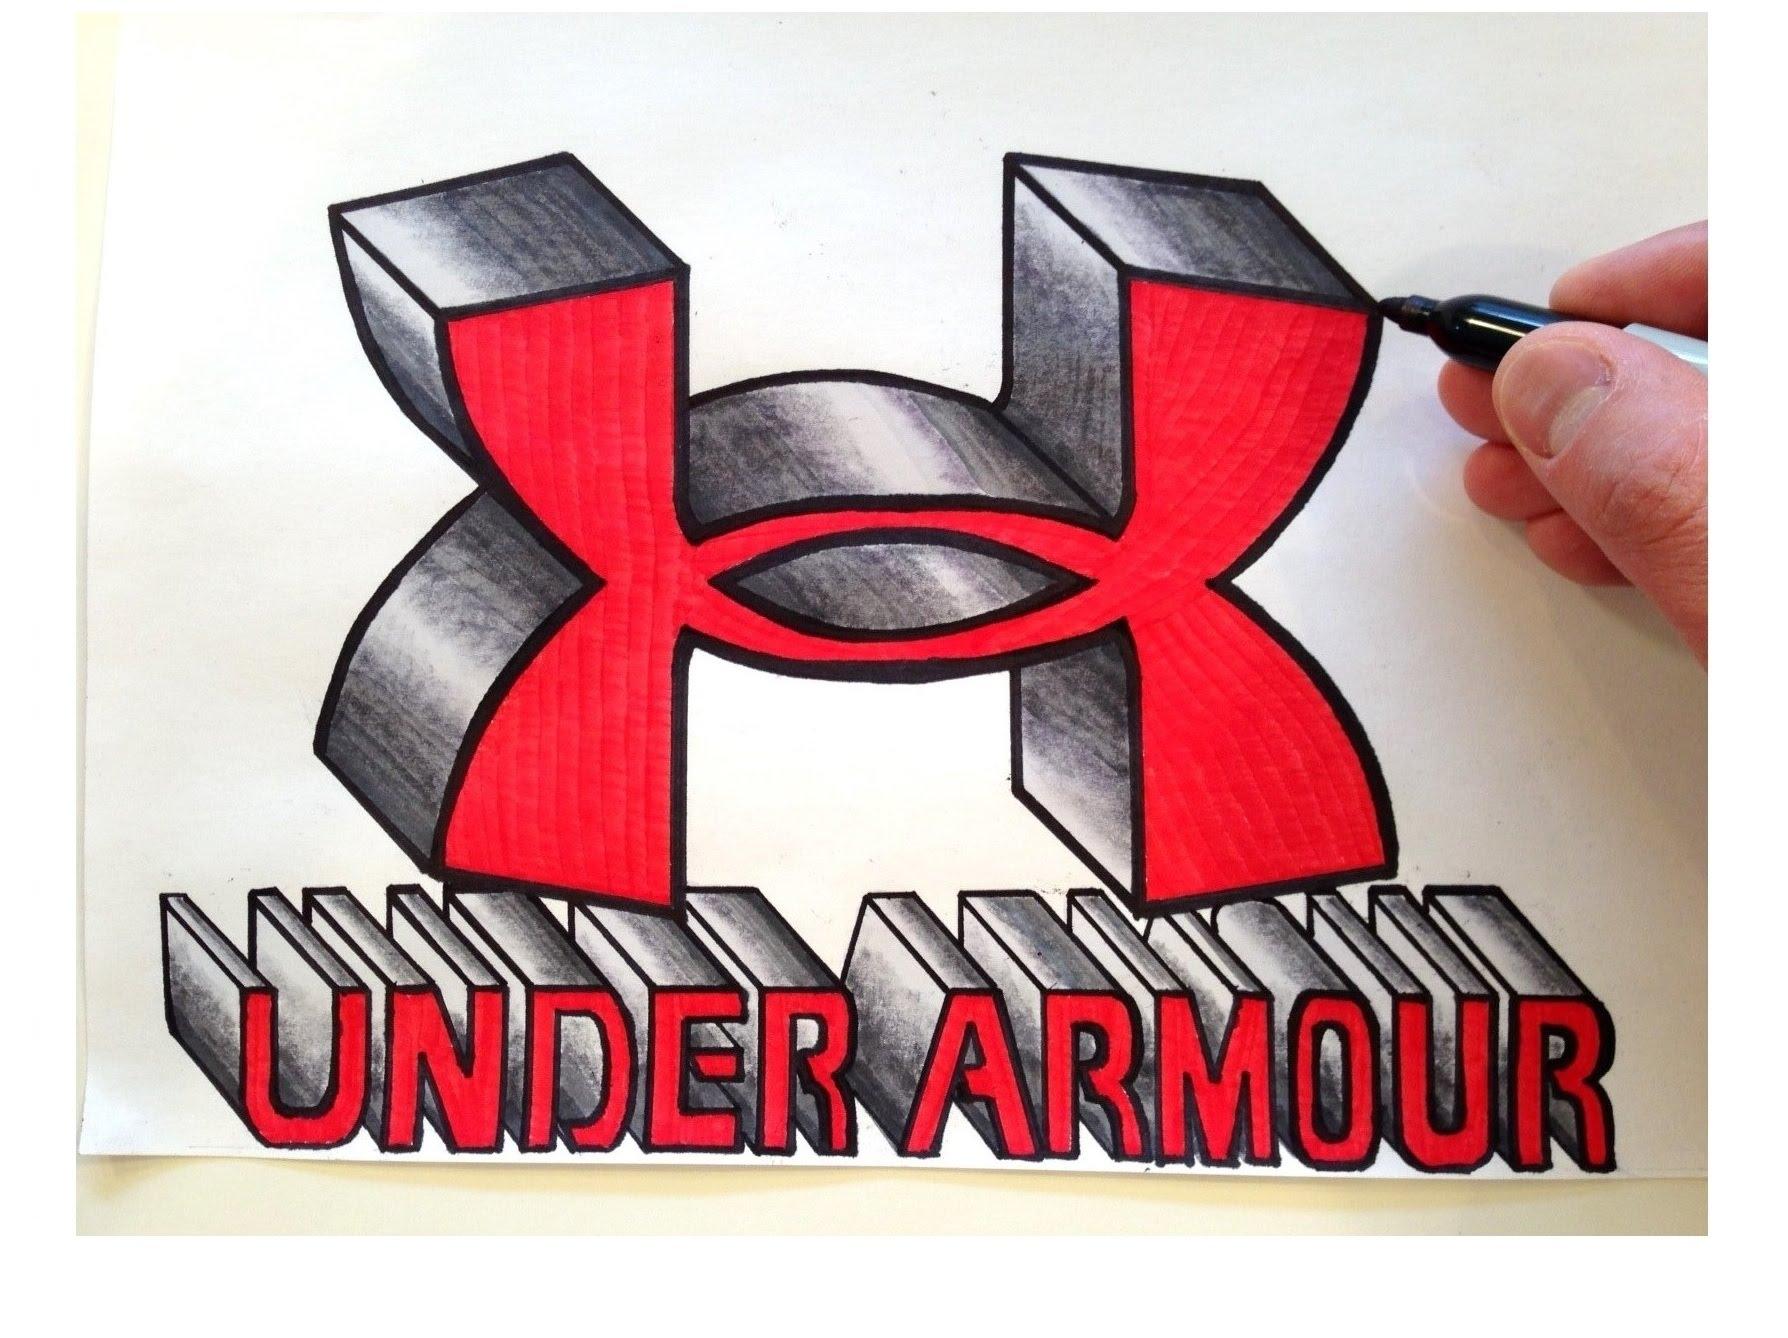 Under Armour customer service